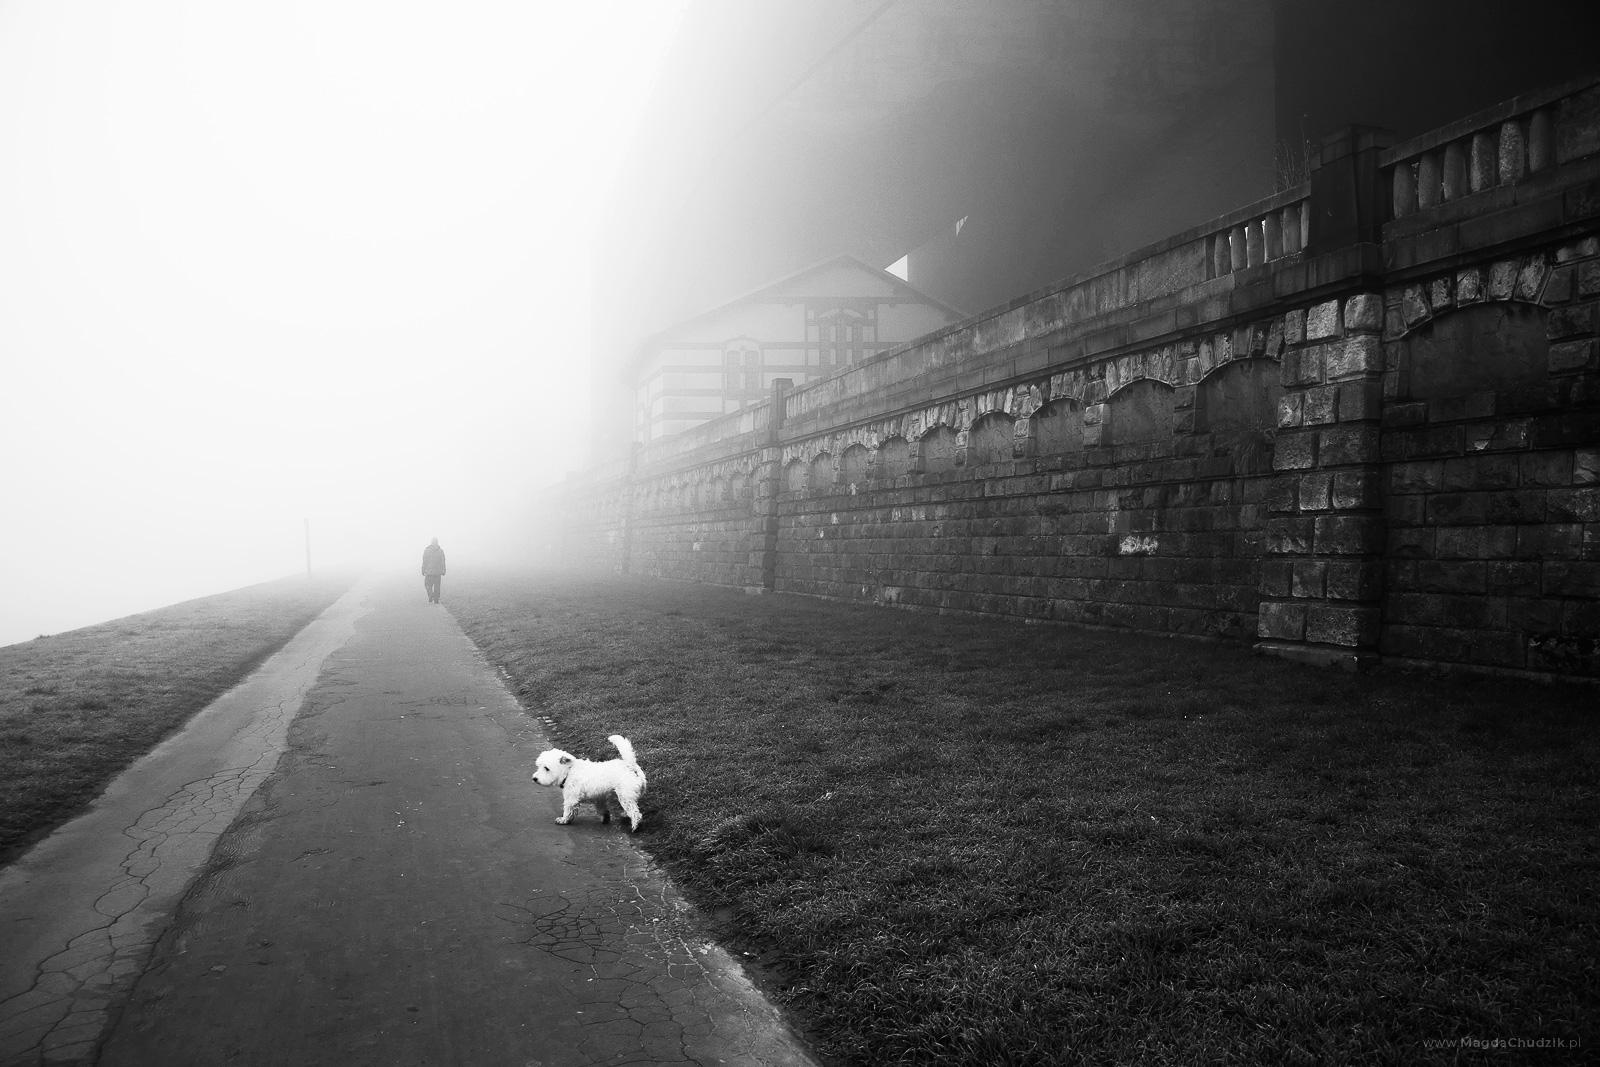 magda-chudzik-street-photography-poland-krakow-022